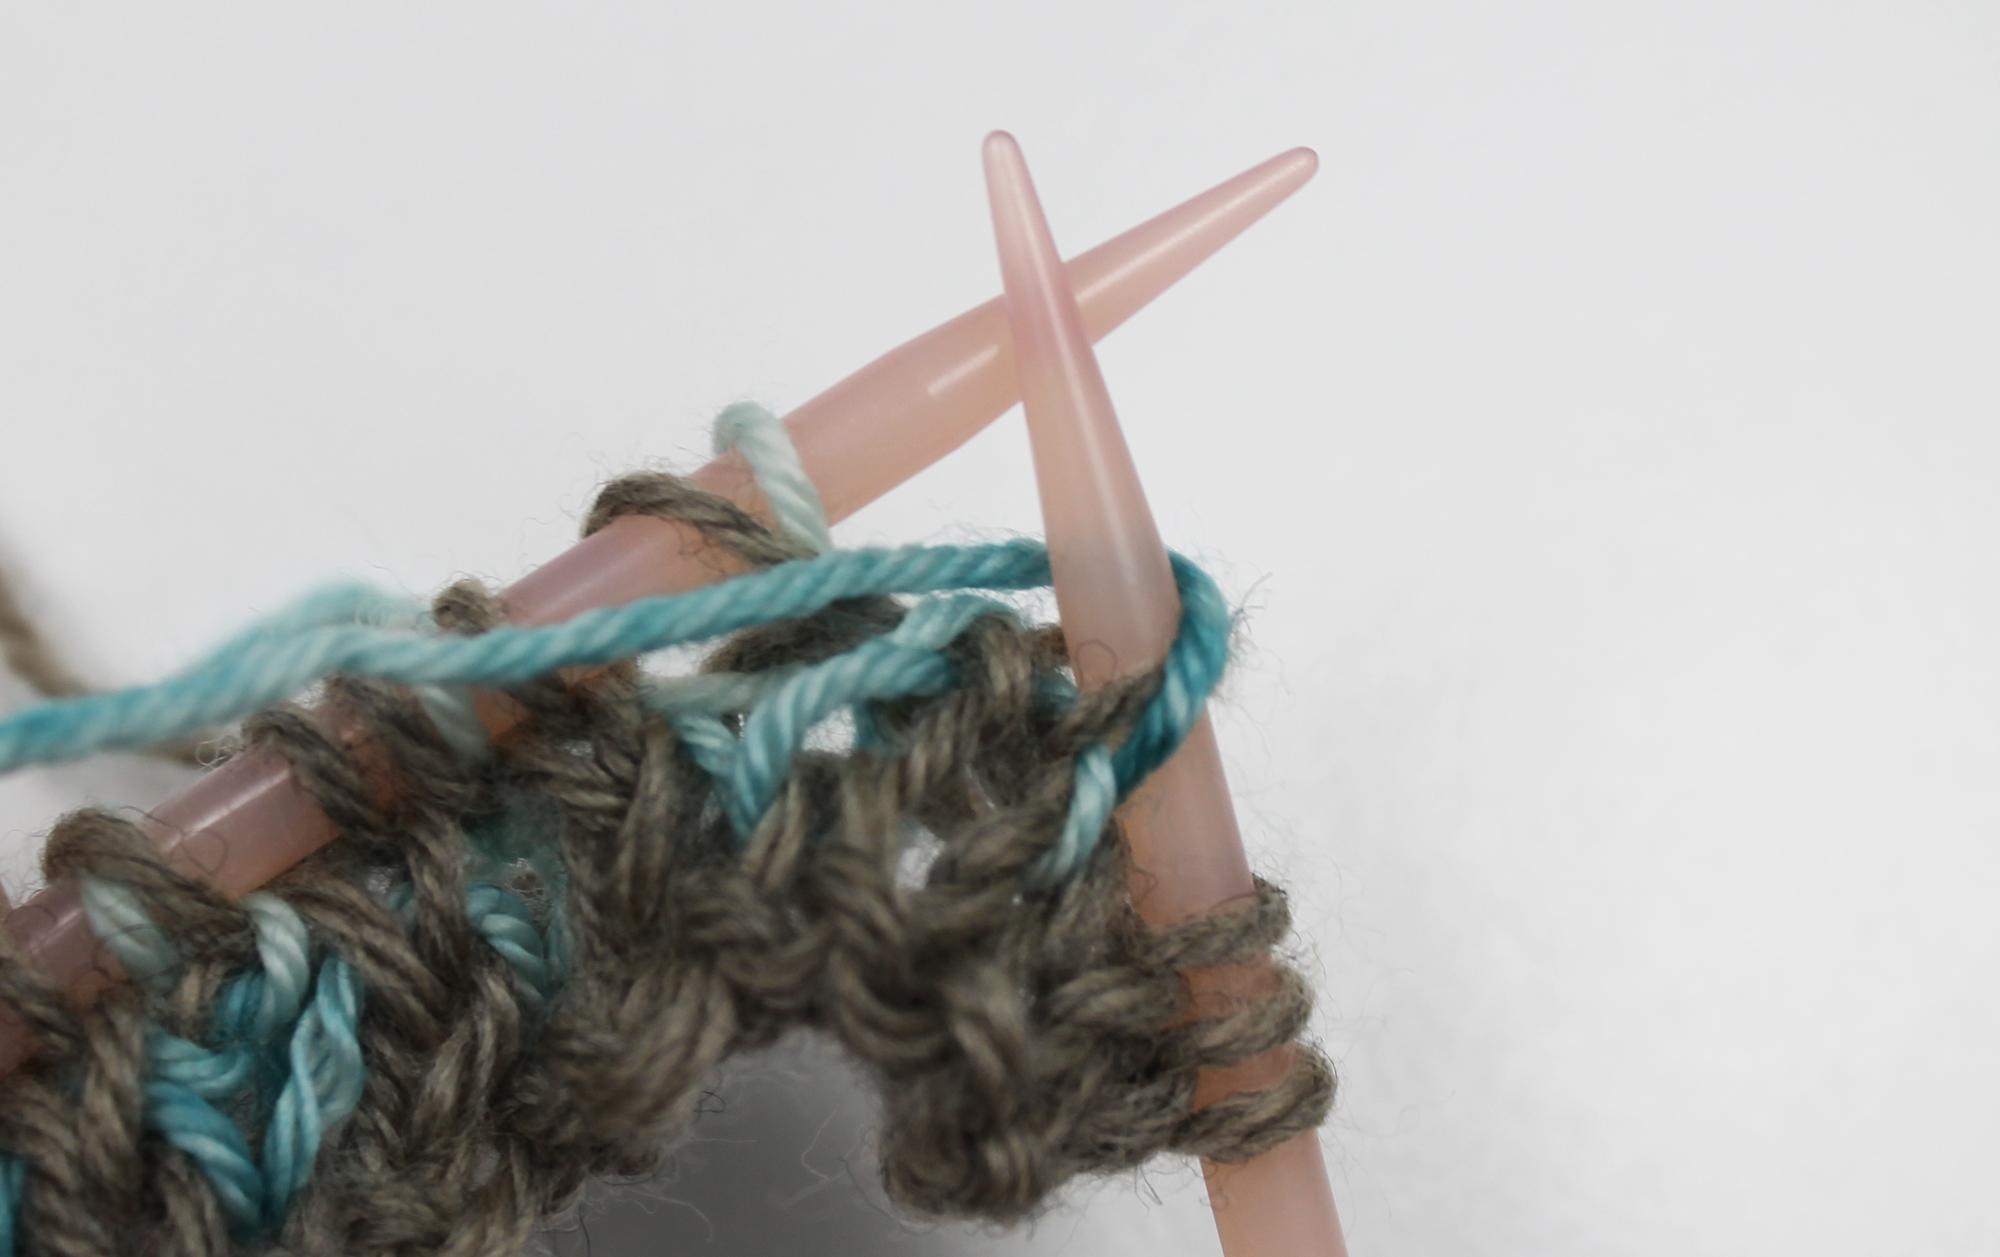 Brioche purl stitch